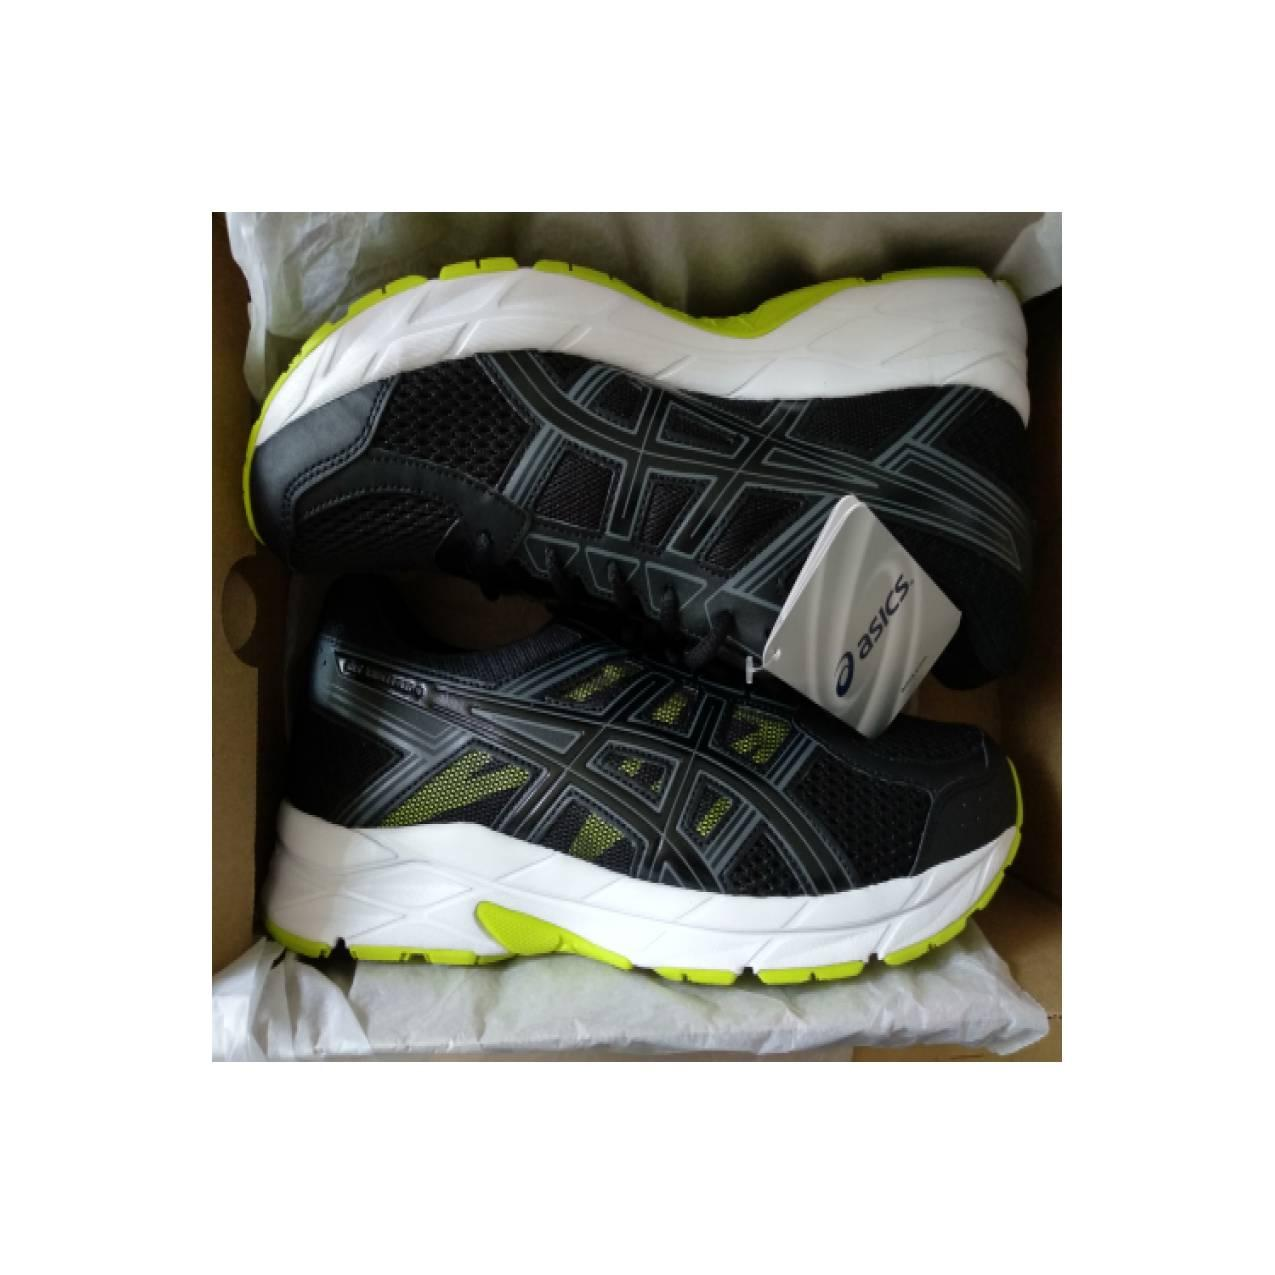 Asics Kanmei Mens Running Shoes Standard Wide Hitam - Daftar Harga ... a87a69786c